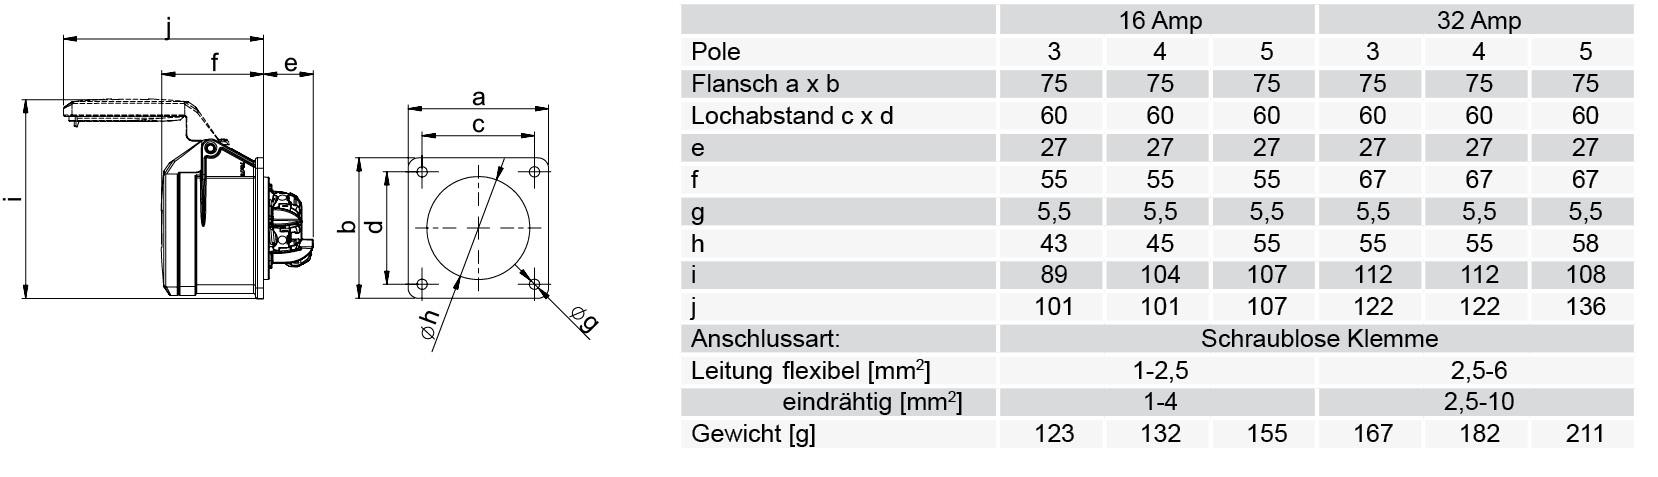 CEE Anbausteckdose gerade 400V 16A IP44 PCE 315-6f7 315-6f7